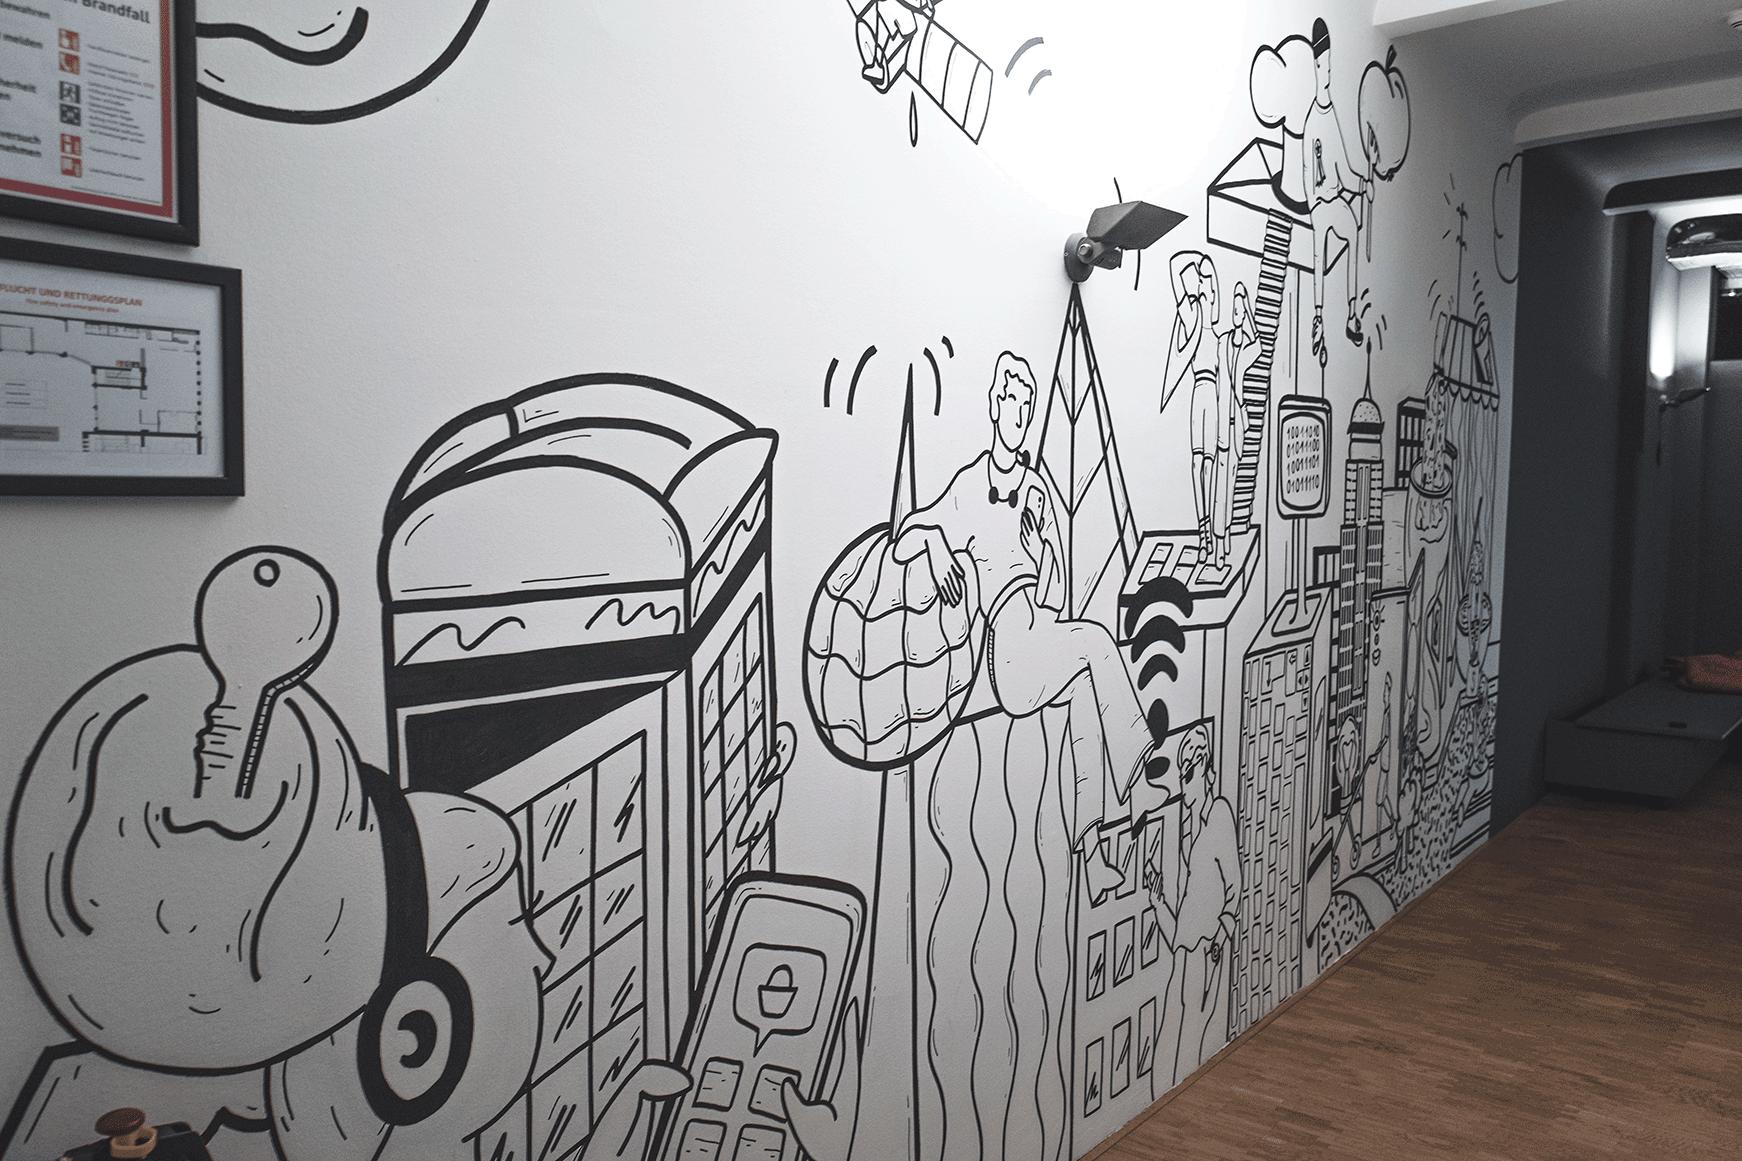 adsquare_walldesign21